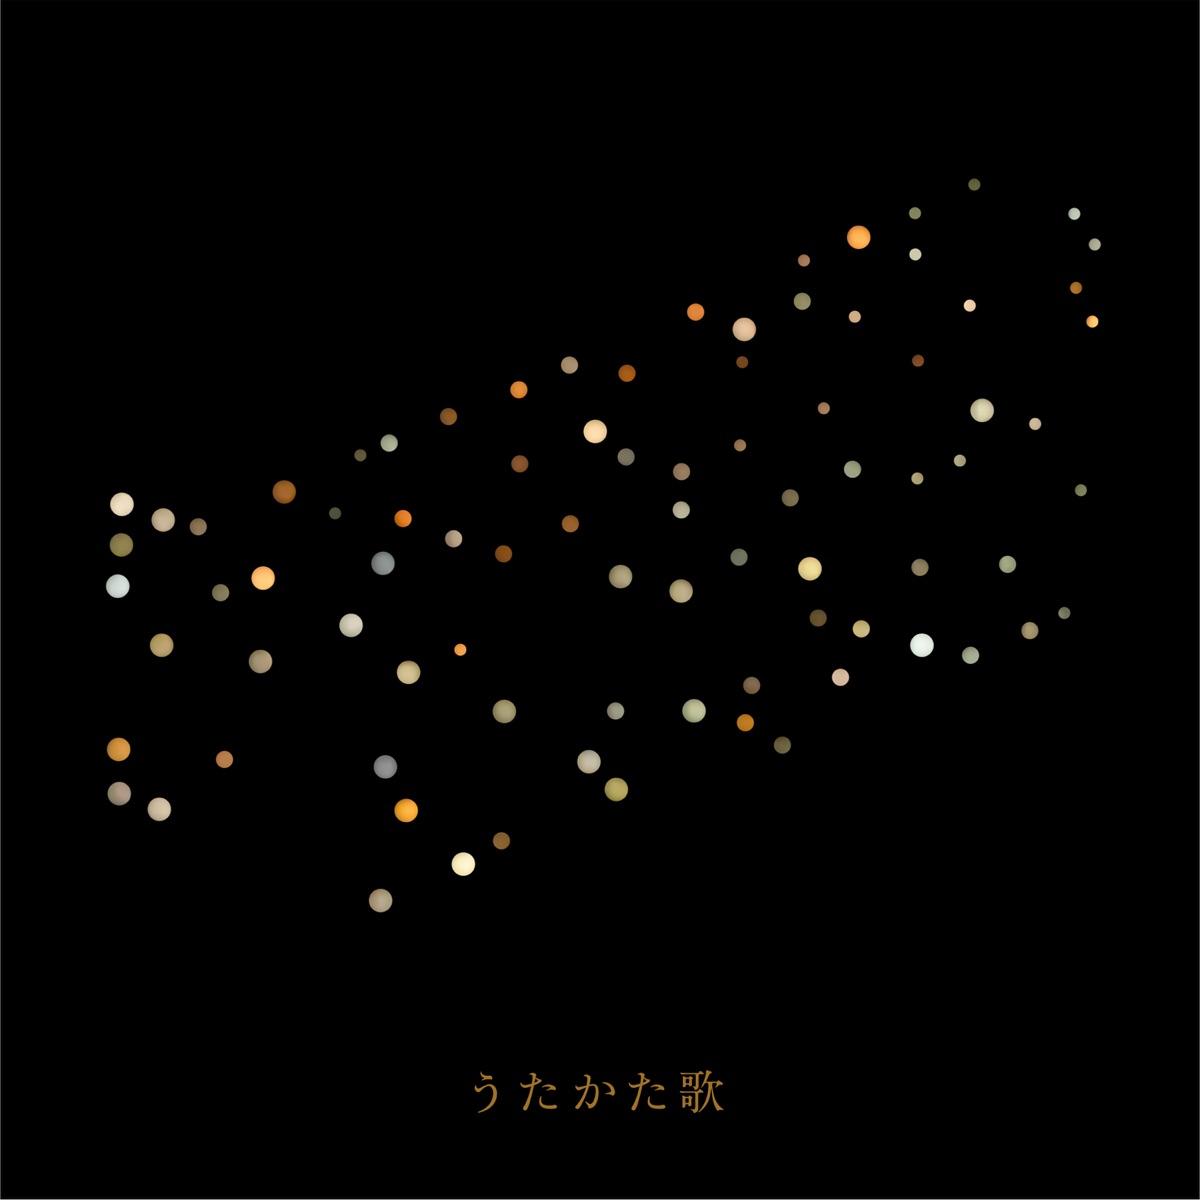 『RADWIMPS feat.菅田将暉 - うたかた歌』収録の『うたかた歌』ジャケット